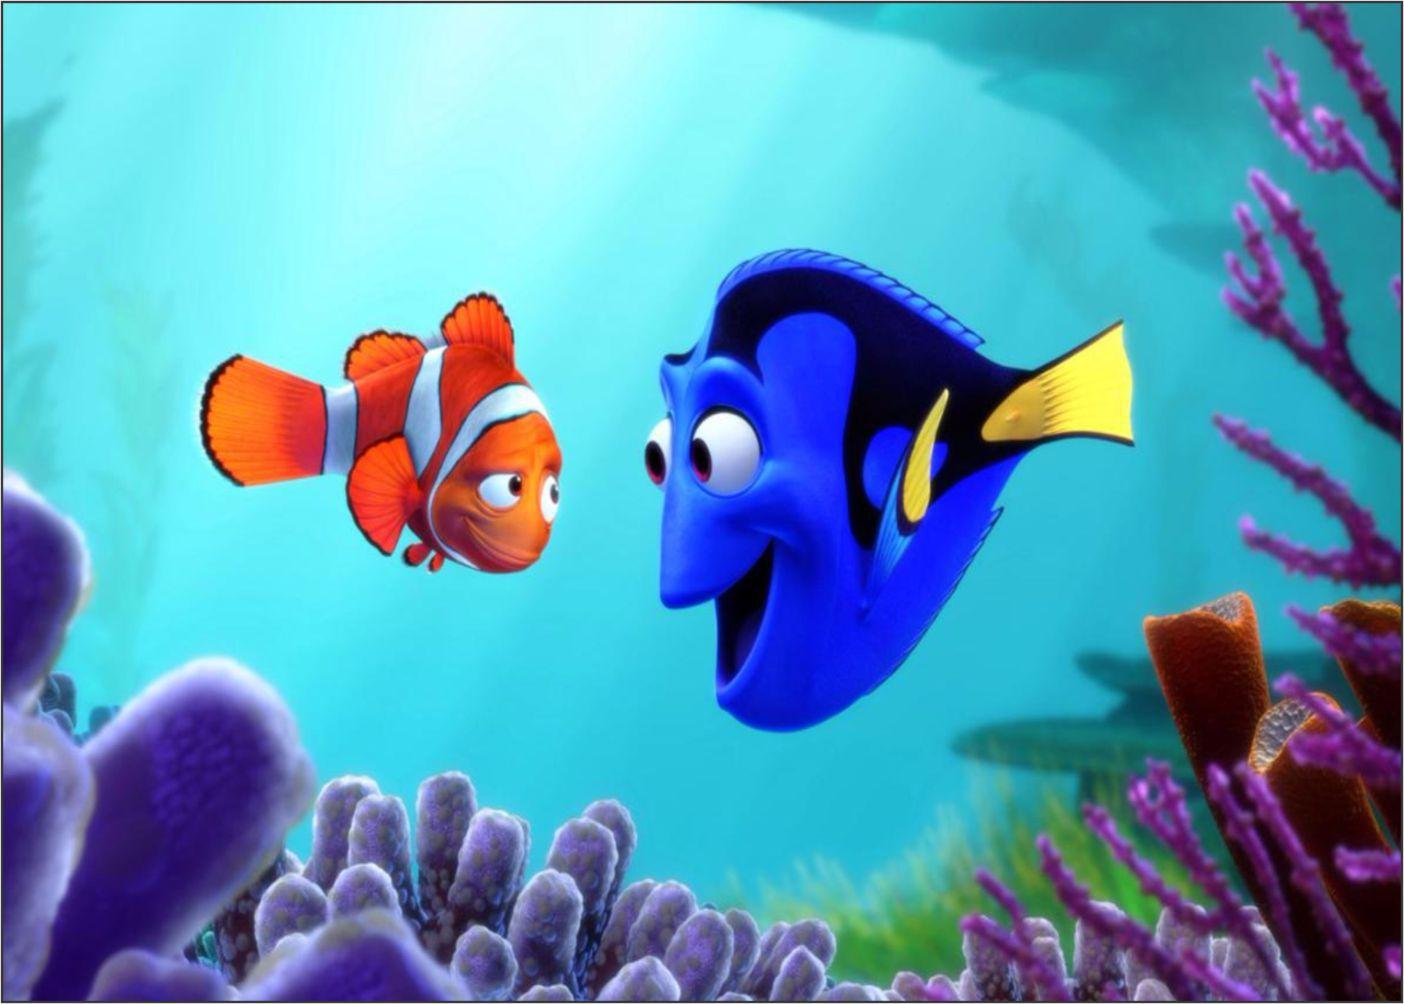 Papel de Parede 3D Nemo 0009 - Adesivos de Parede  - Paredes Decoradas